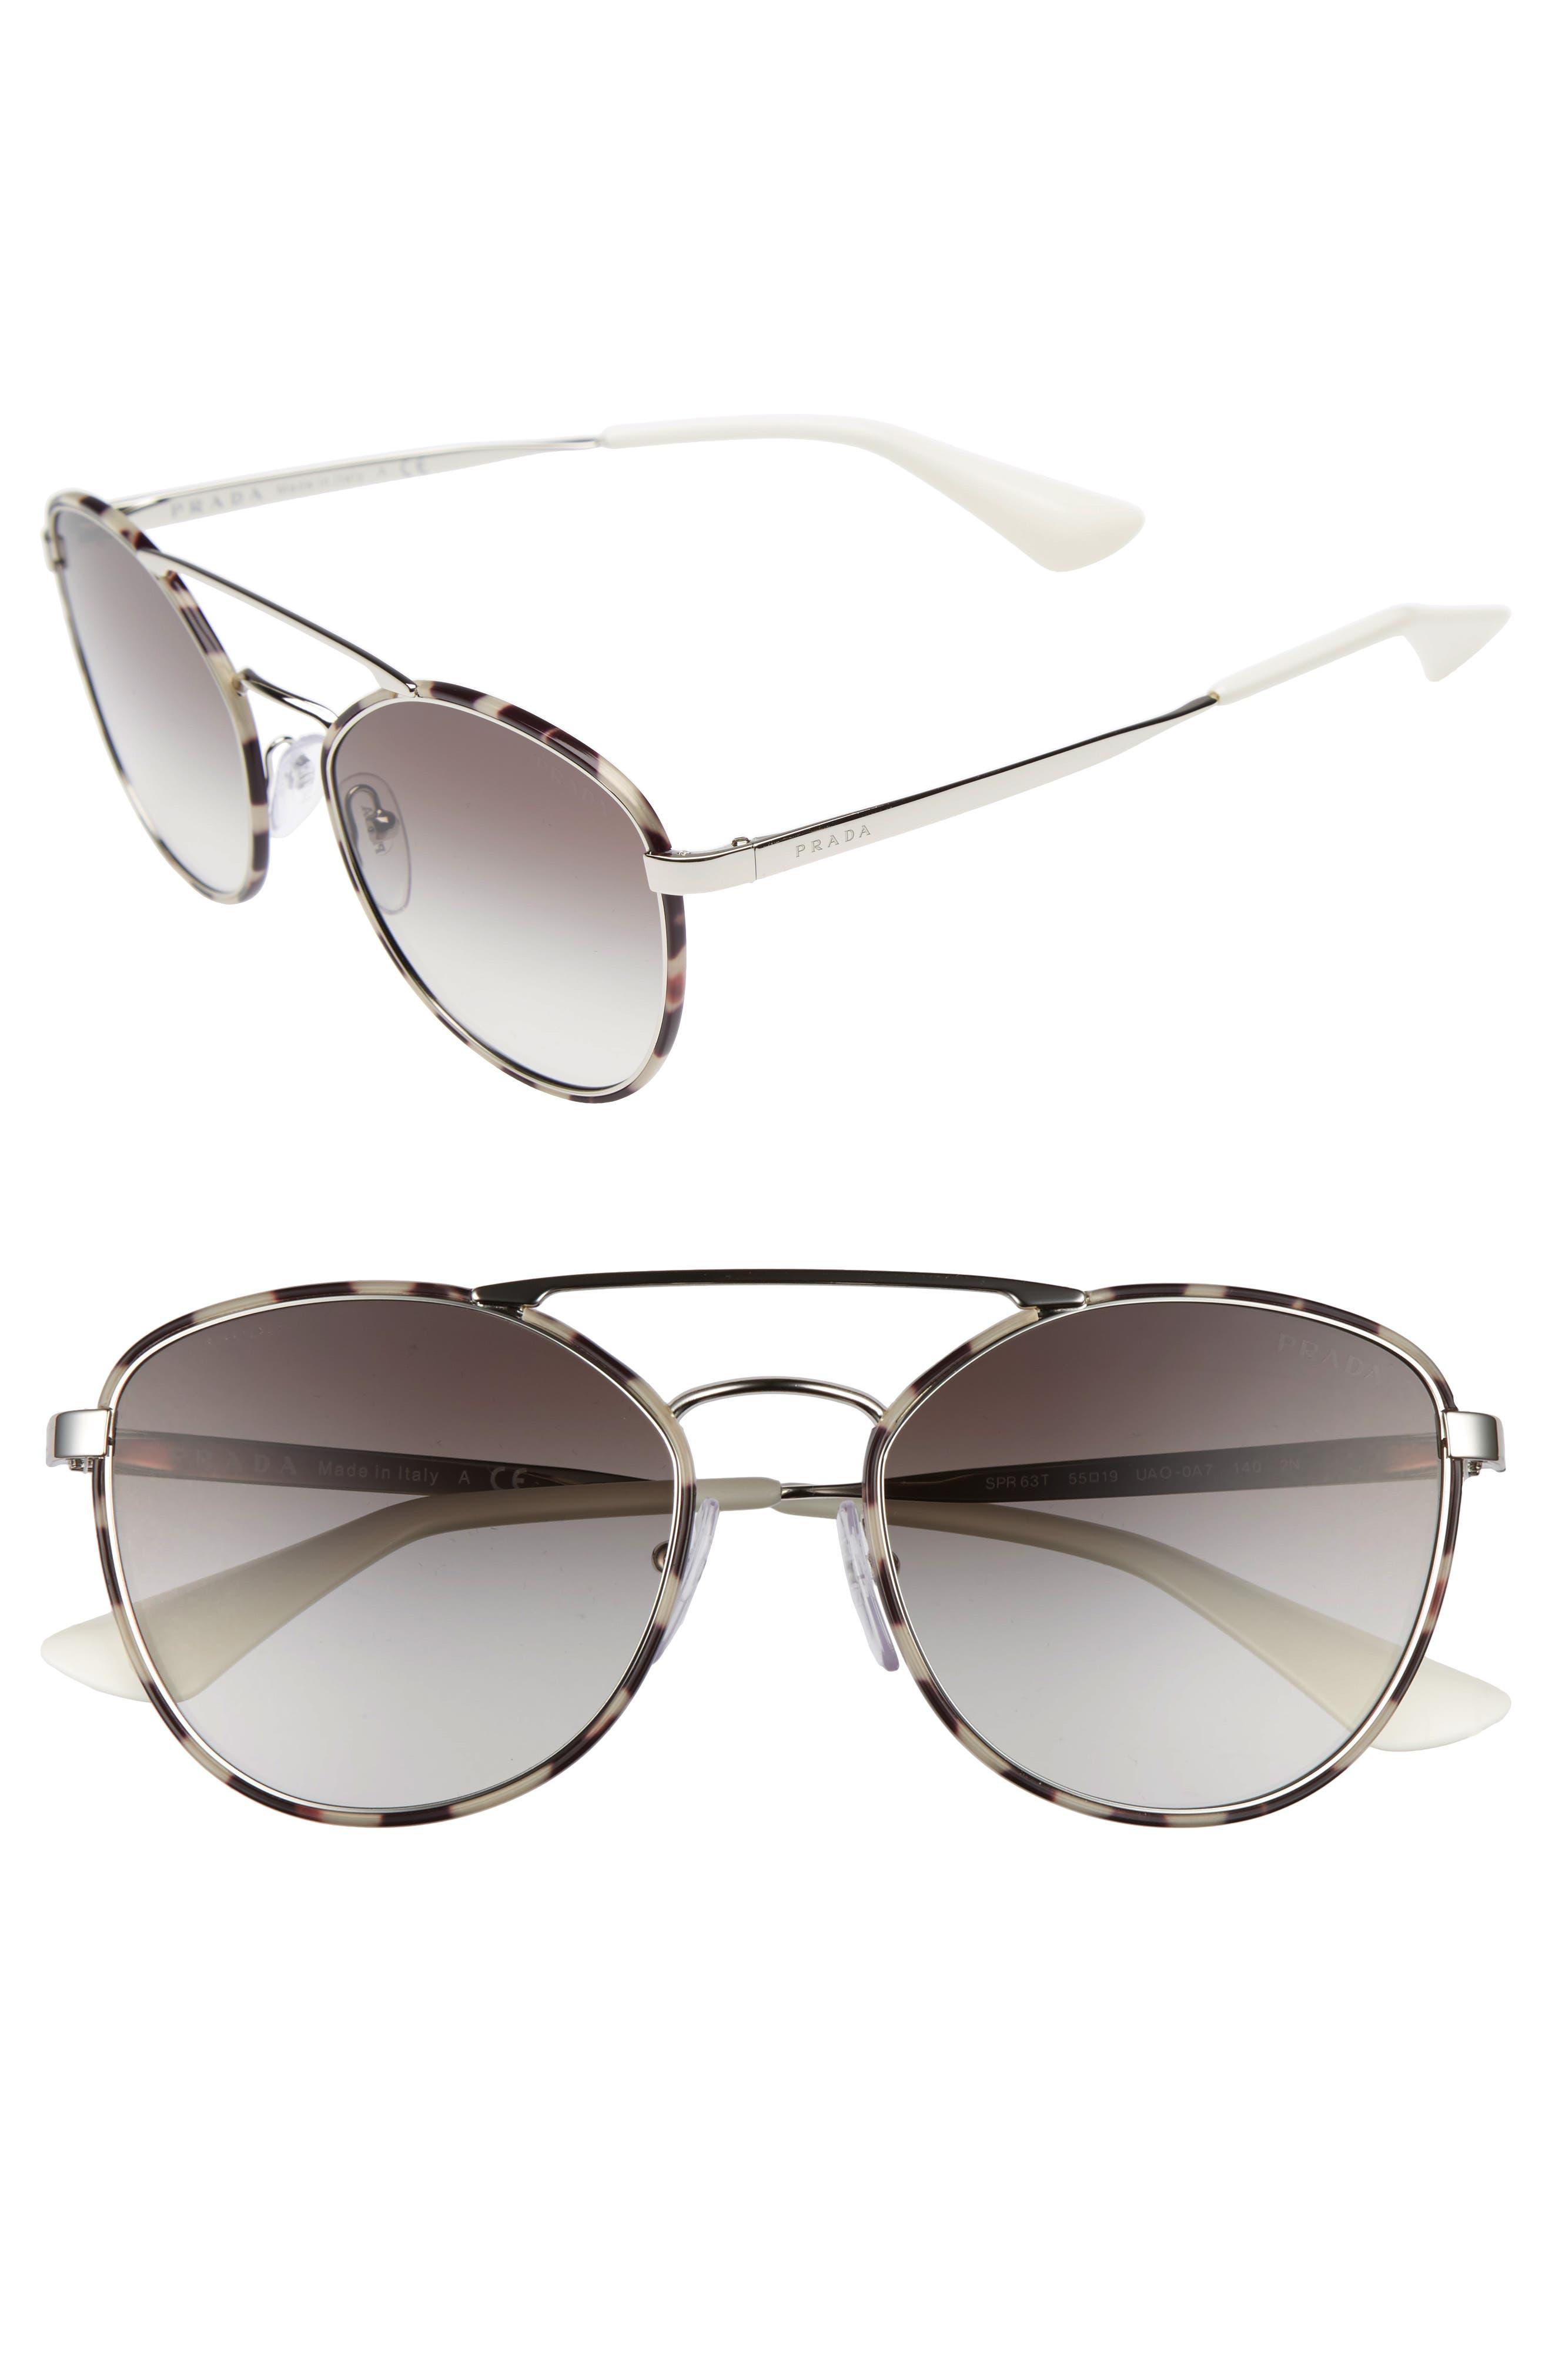 Main Image - Prada 55mm Gradient Aviator Sunglasses